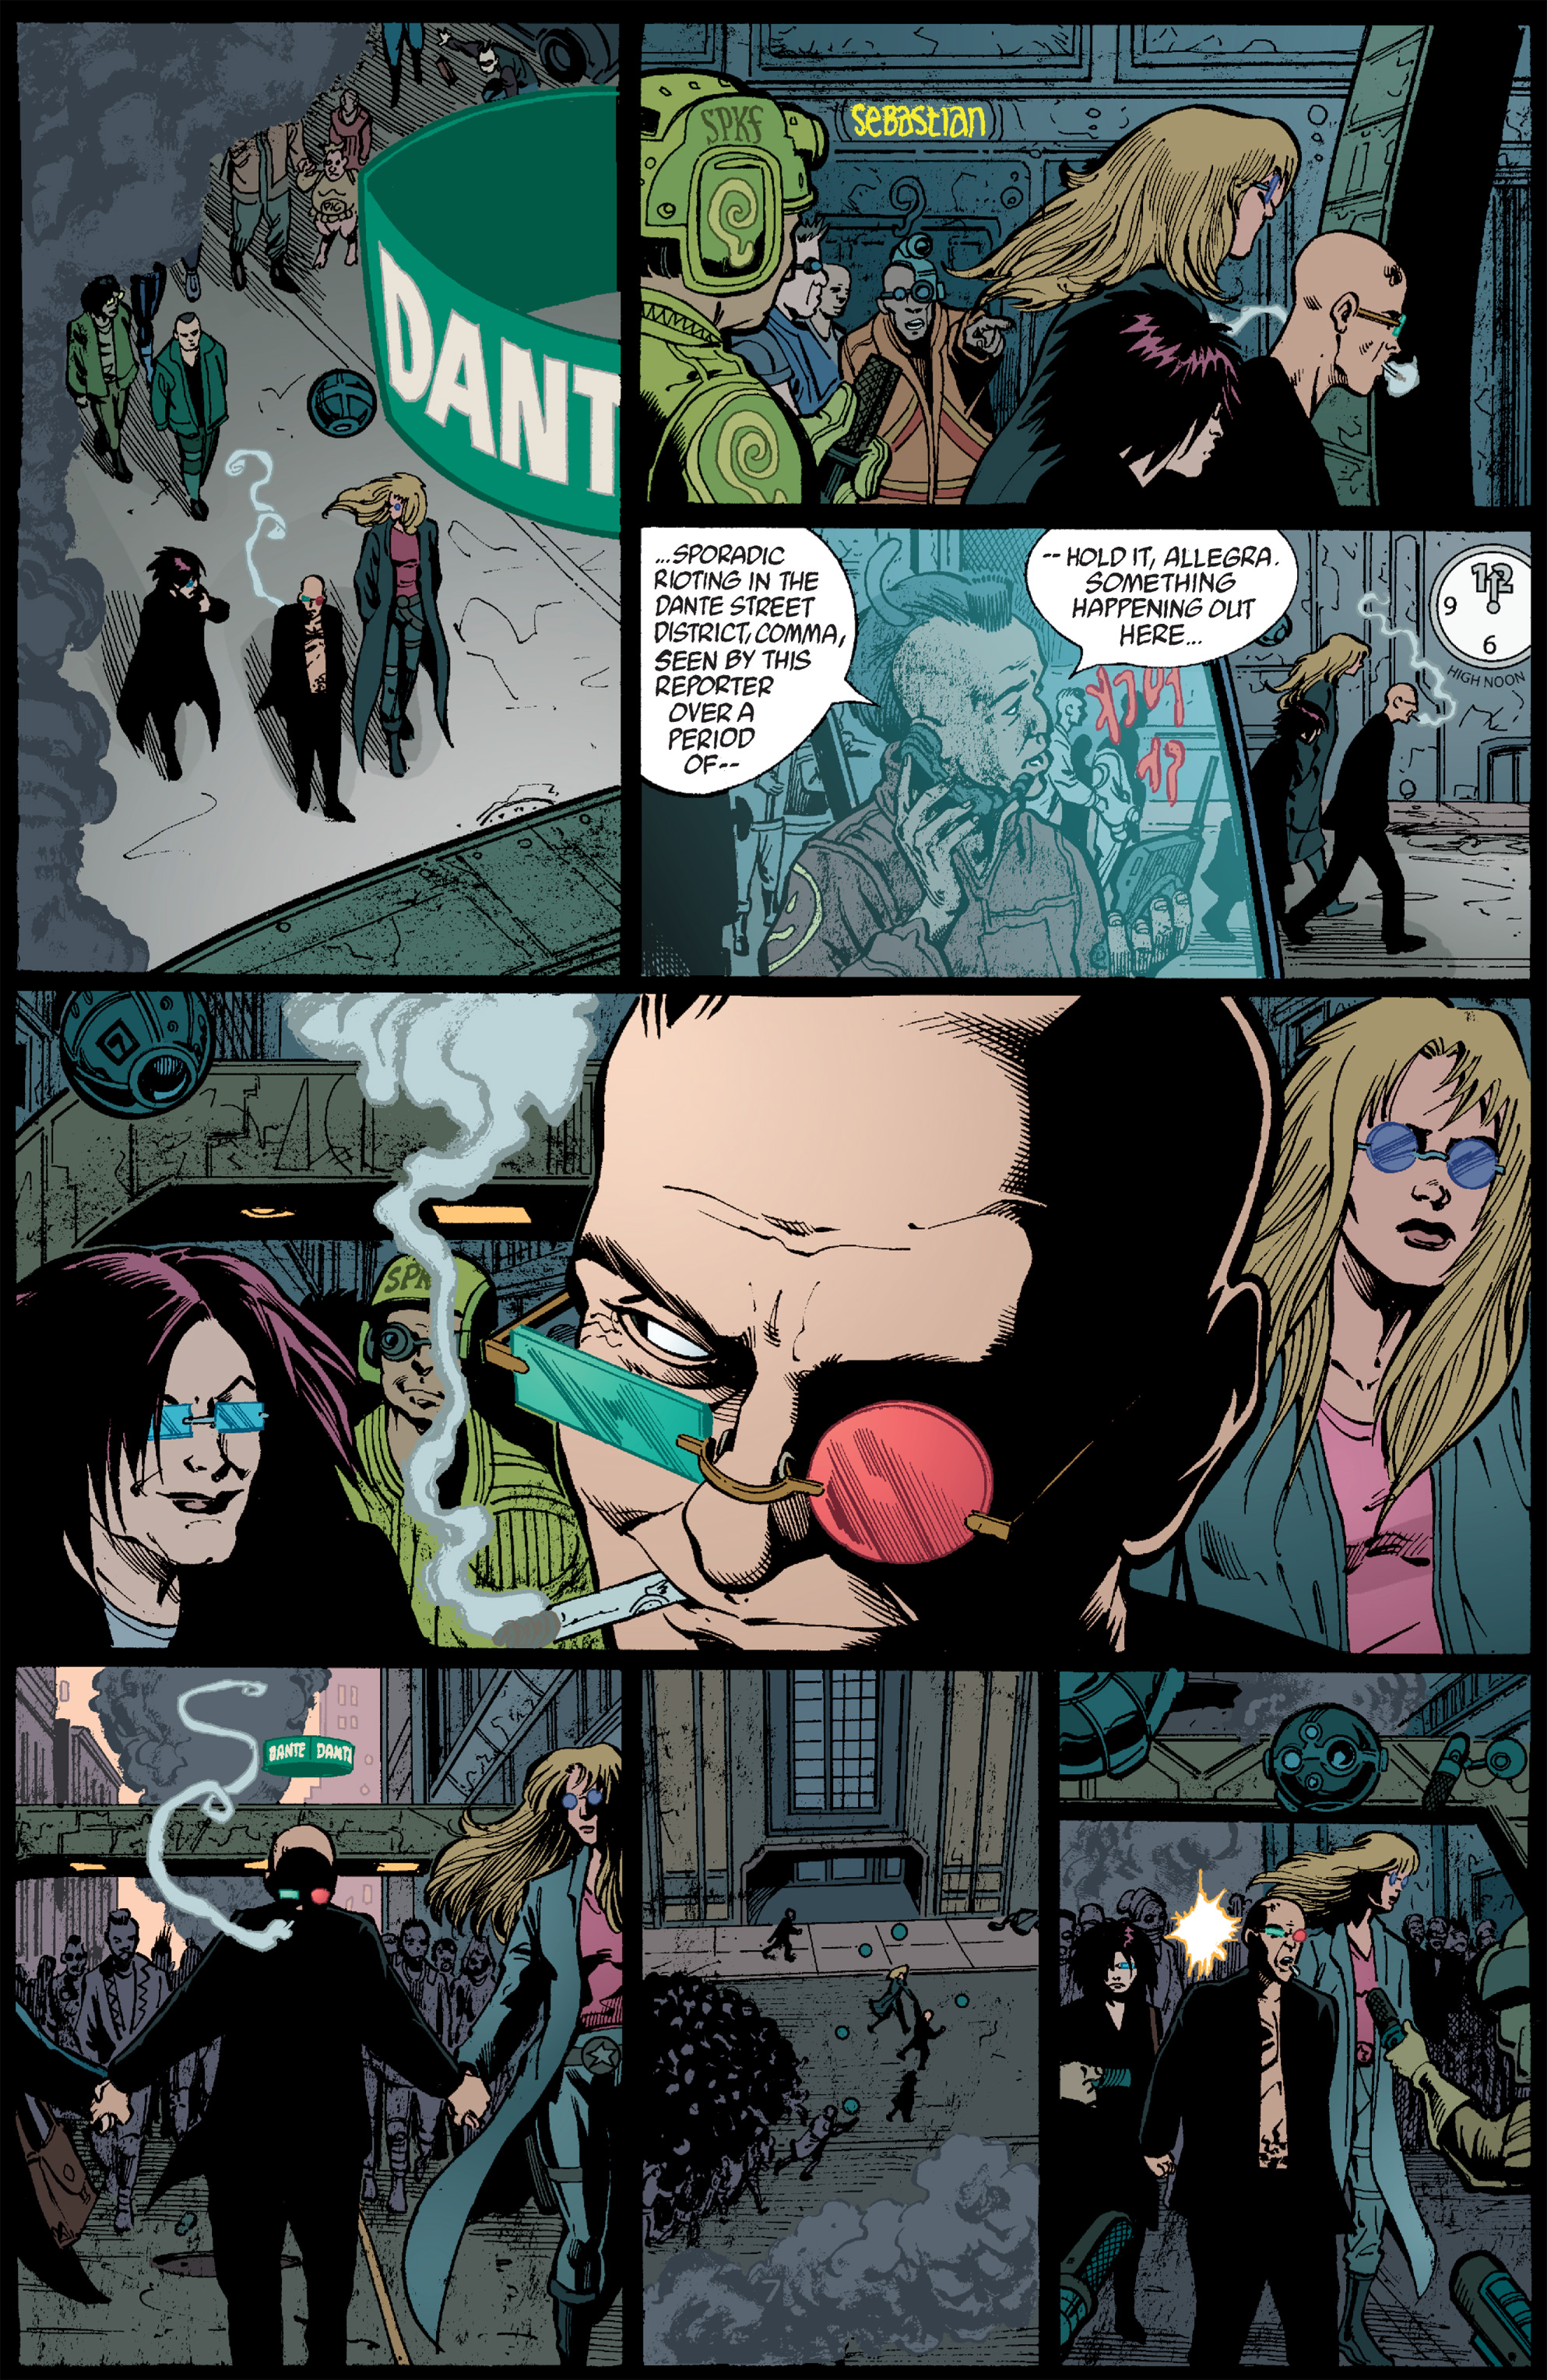 Read online Transmetropolitan comic -  Issue #59 - 8